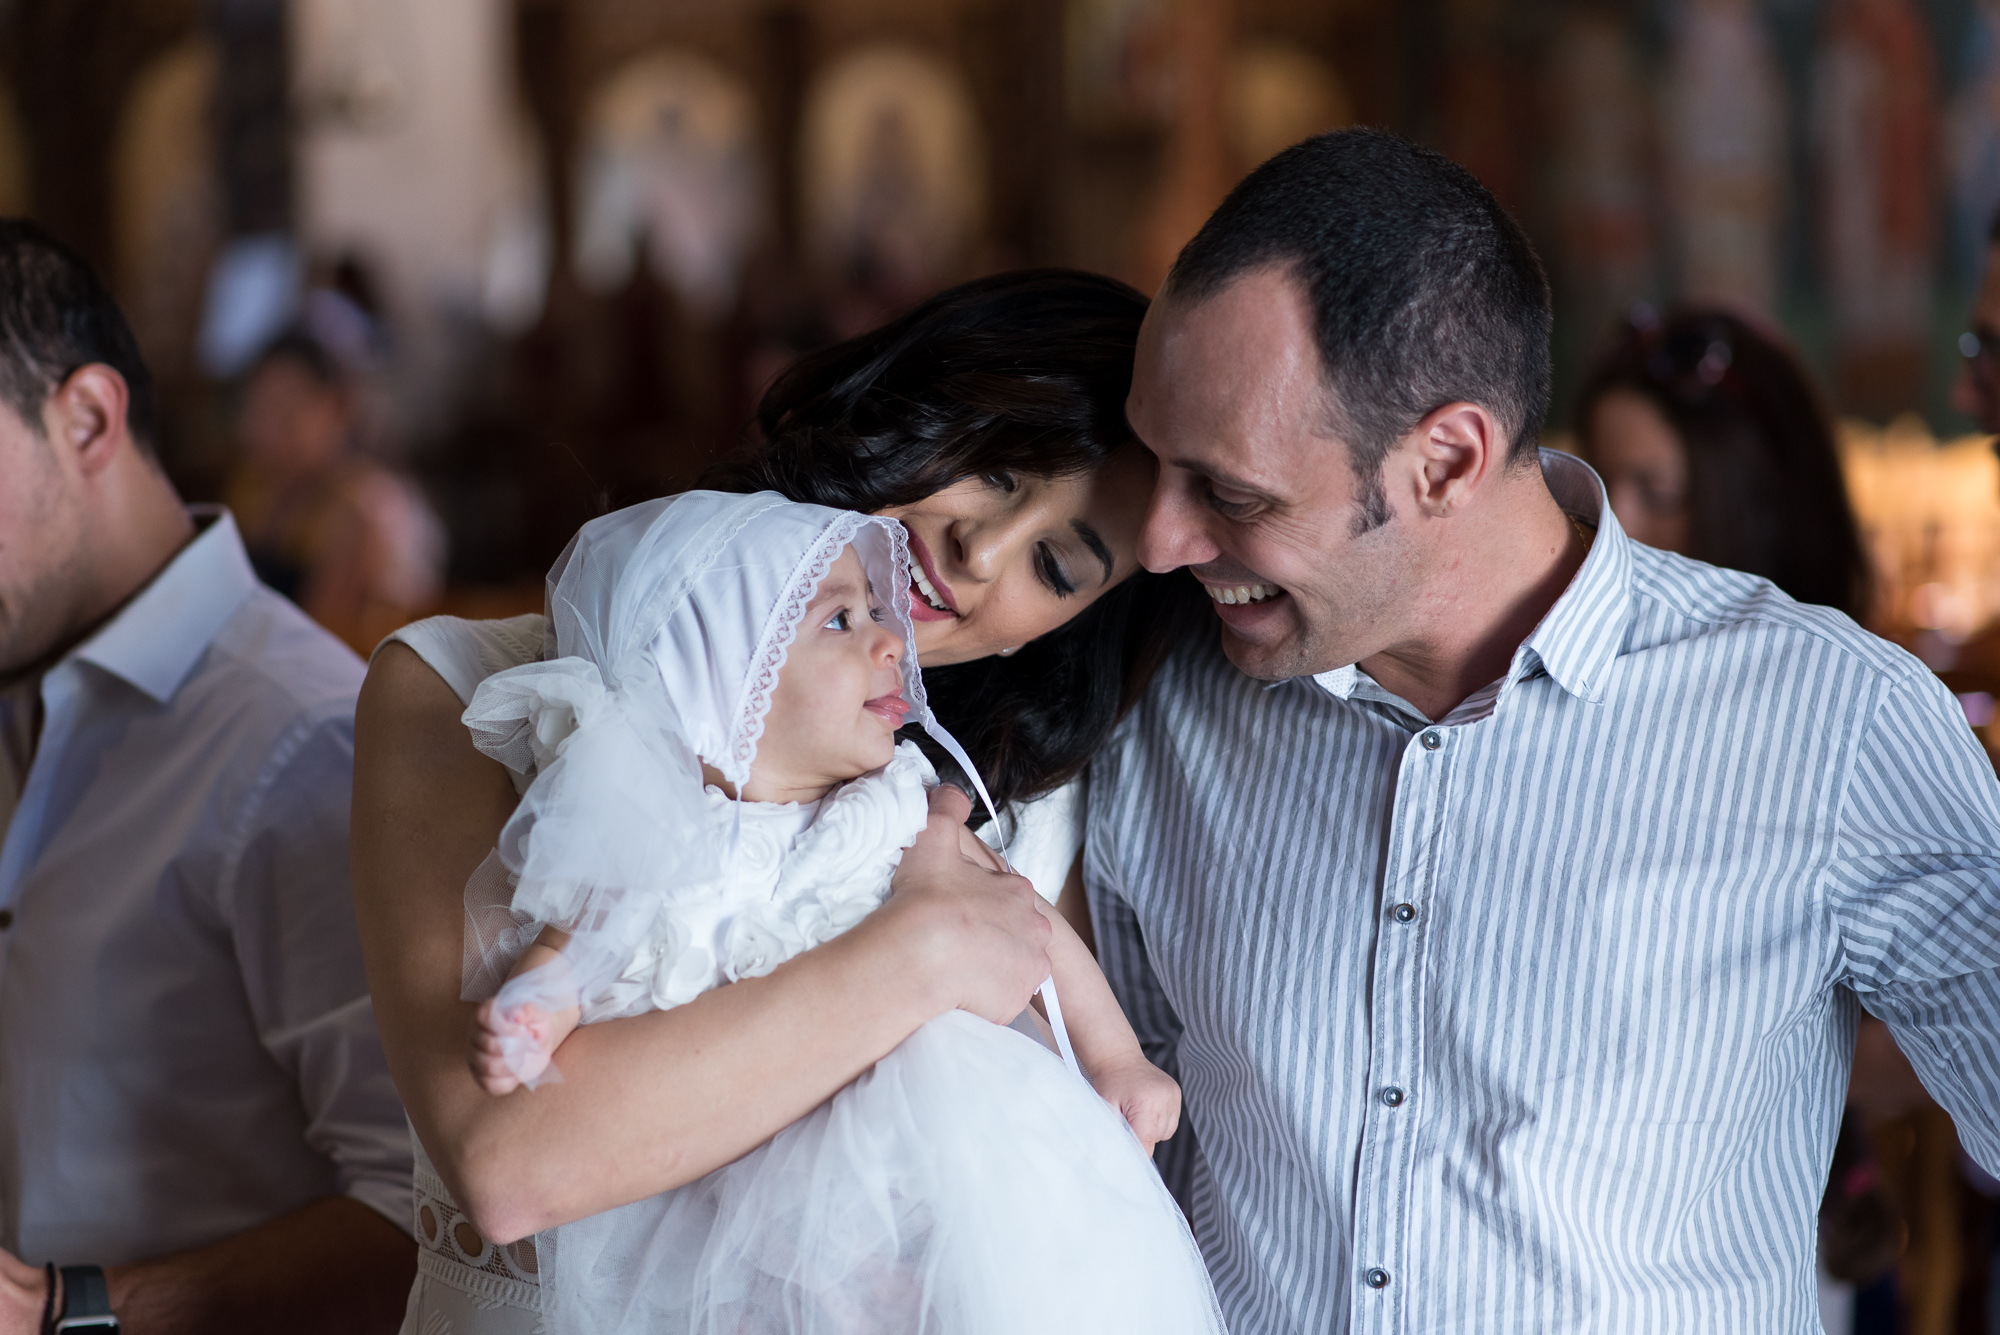 Christening cyprus βαπτιση  κυπρος lovely family.jpg